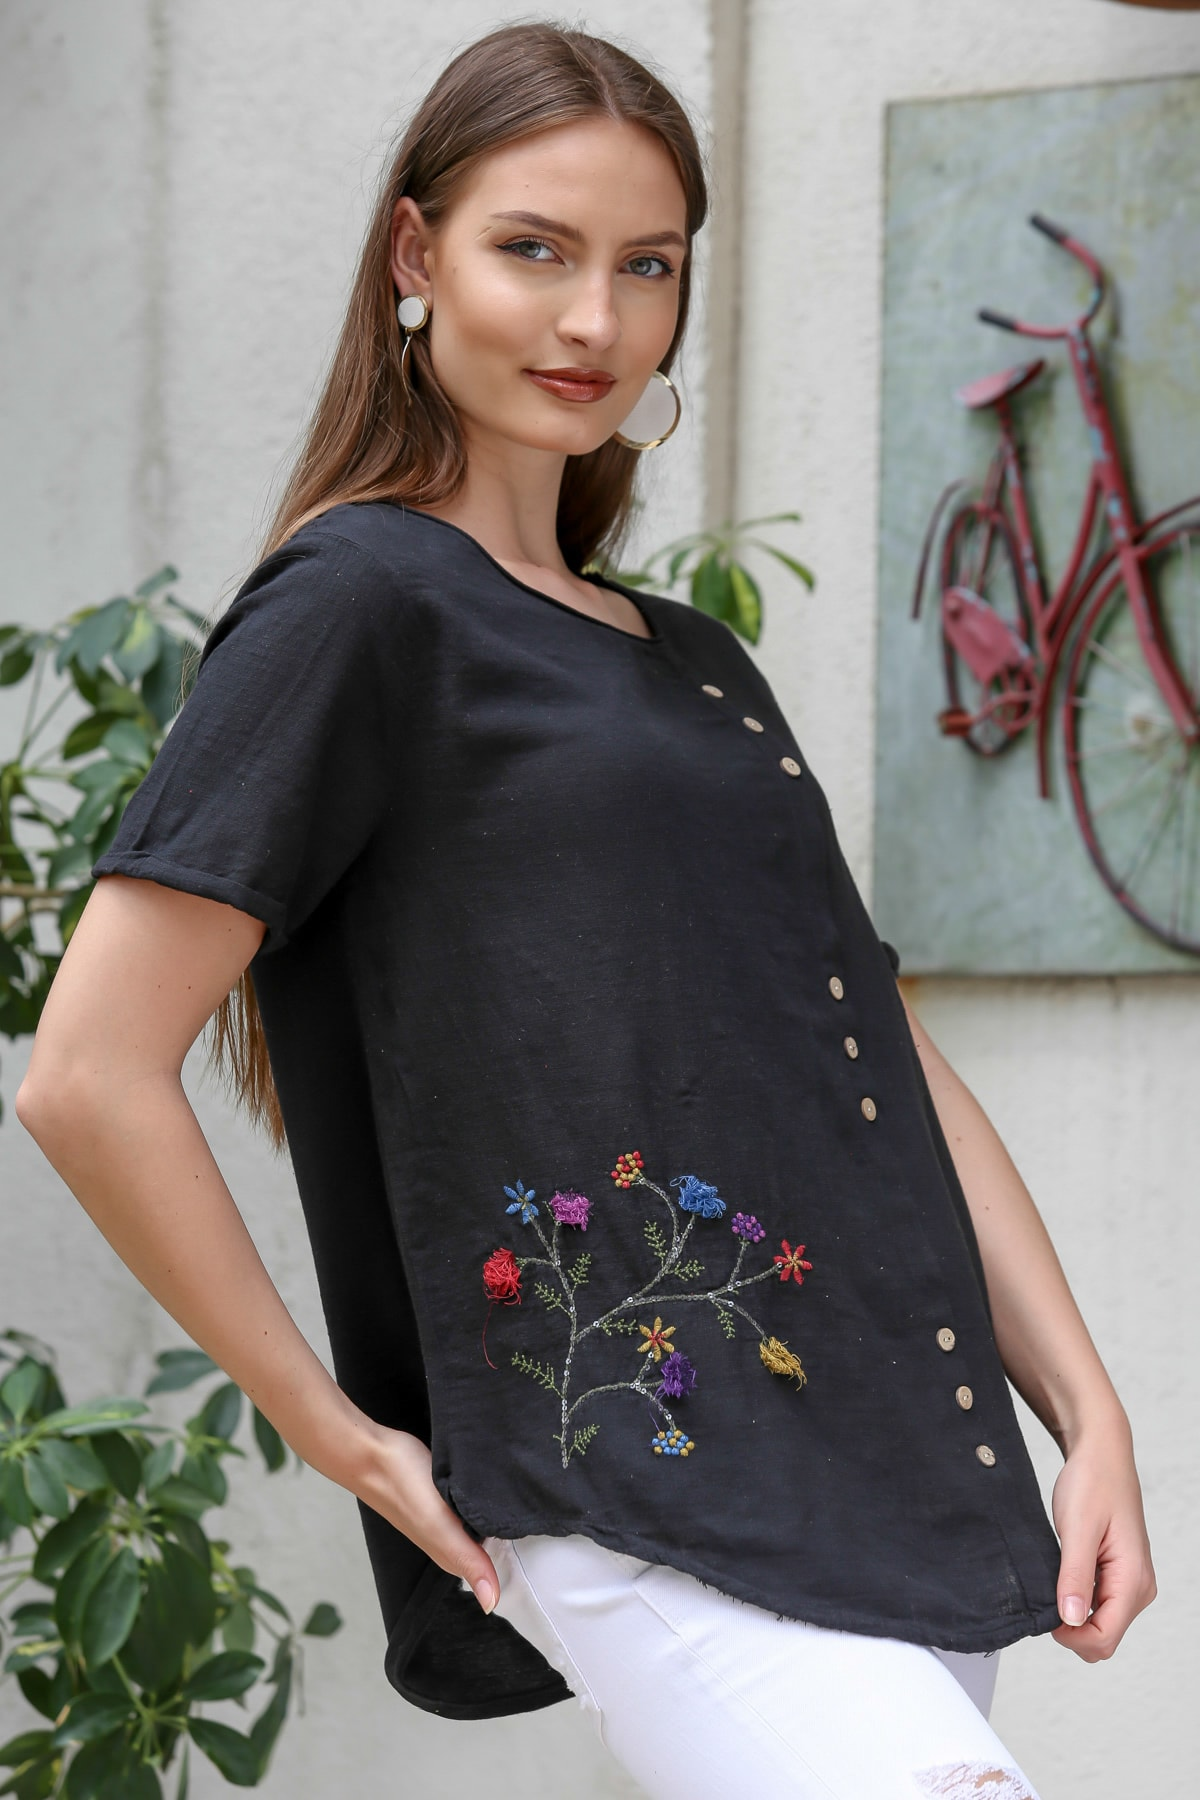 Chiccy Kadın Siyah Çiçek Buketi 3D Nakışlı Düğme Detaylı Salaş Dokuma Bluz M10010200BL95280 1